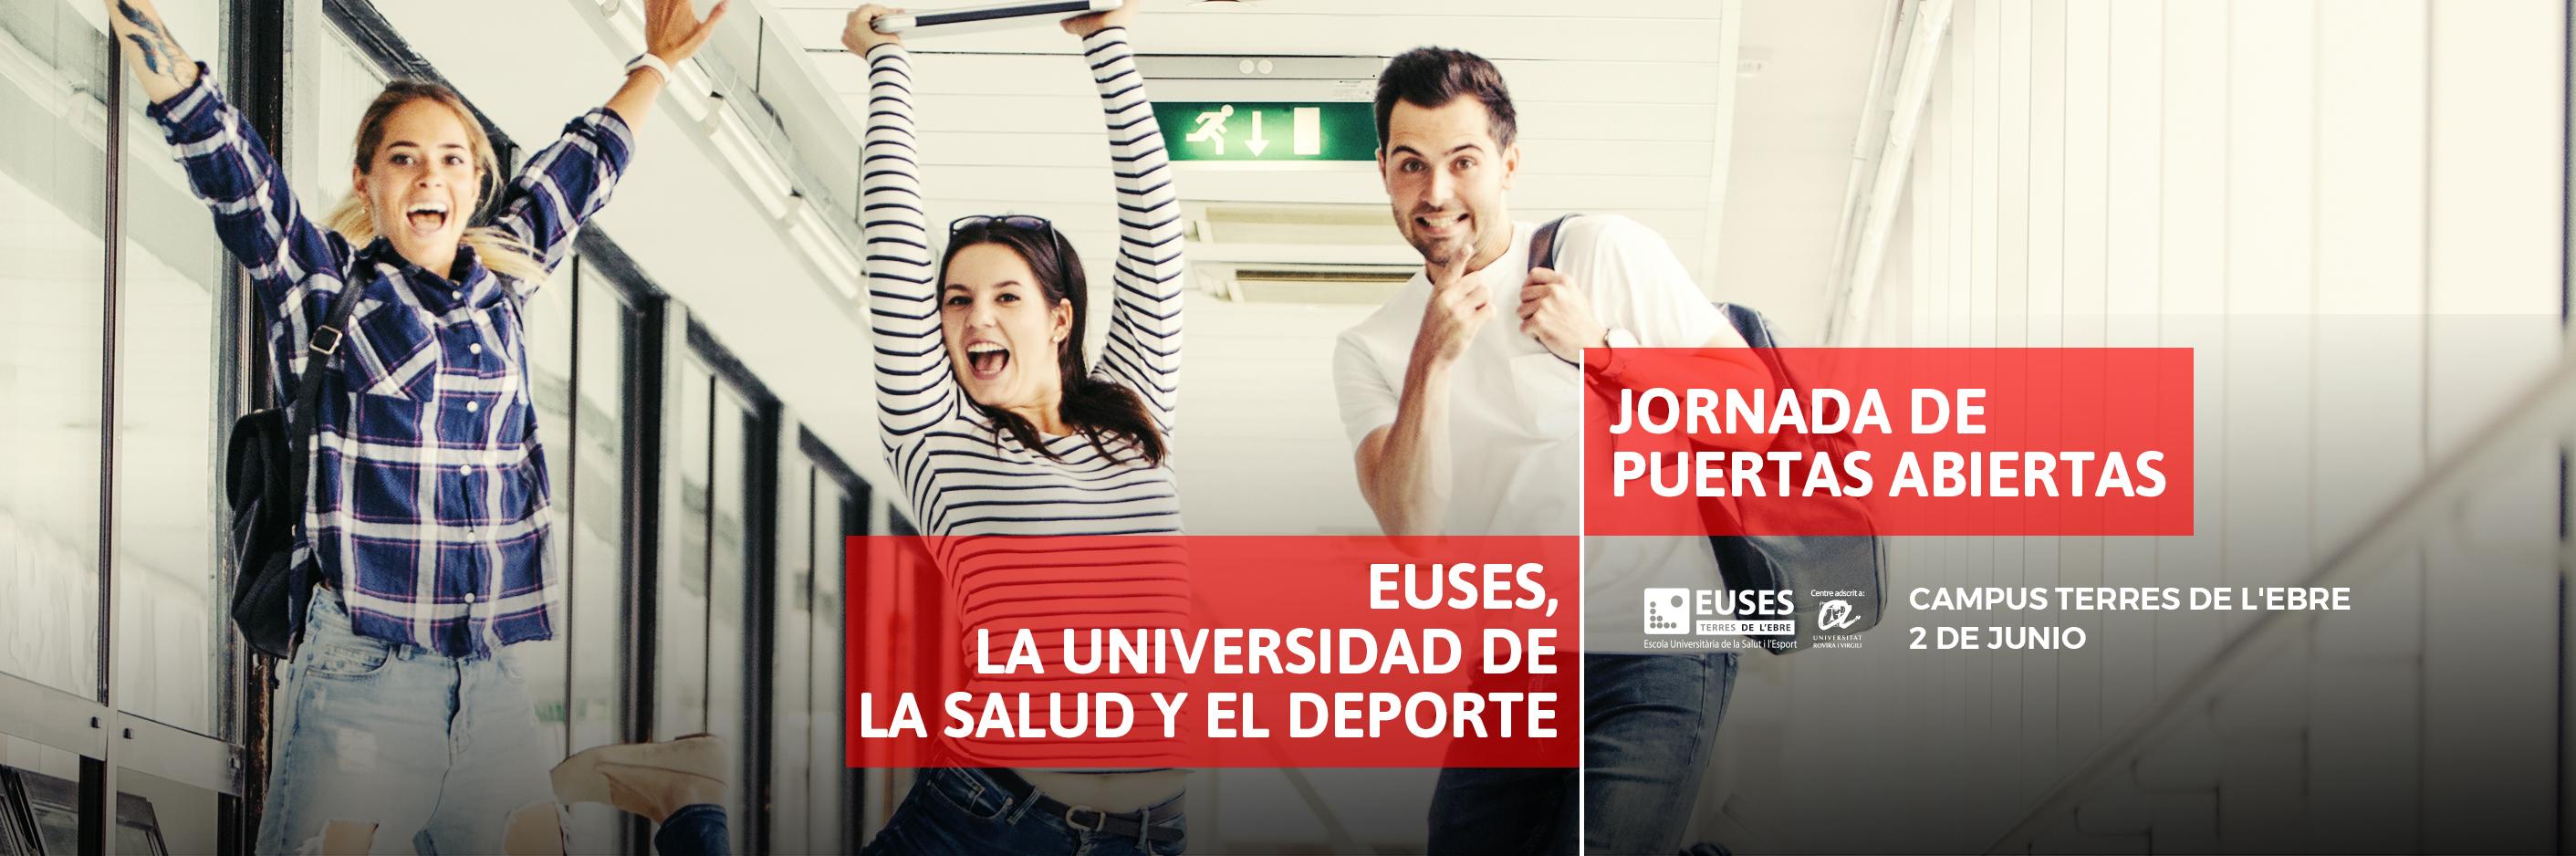 EUSES-PuertasAbiertas6-slide-web_ESP